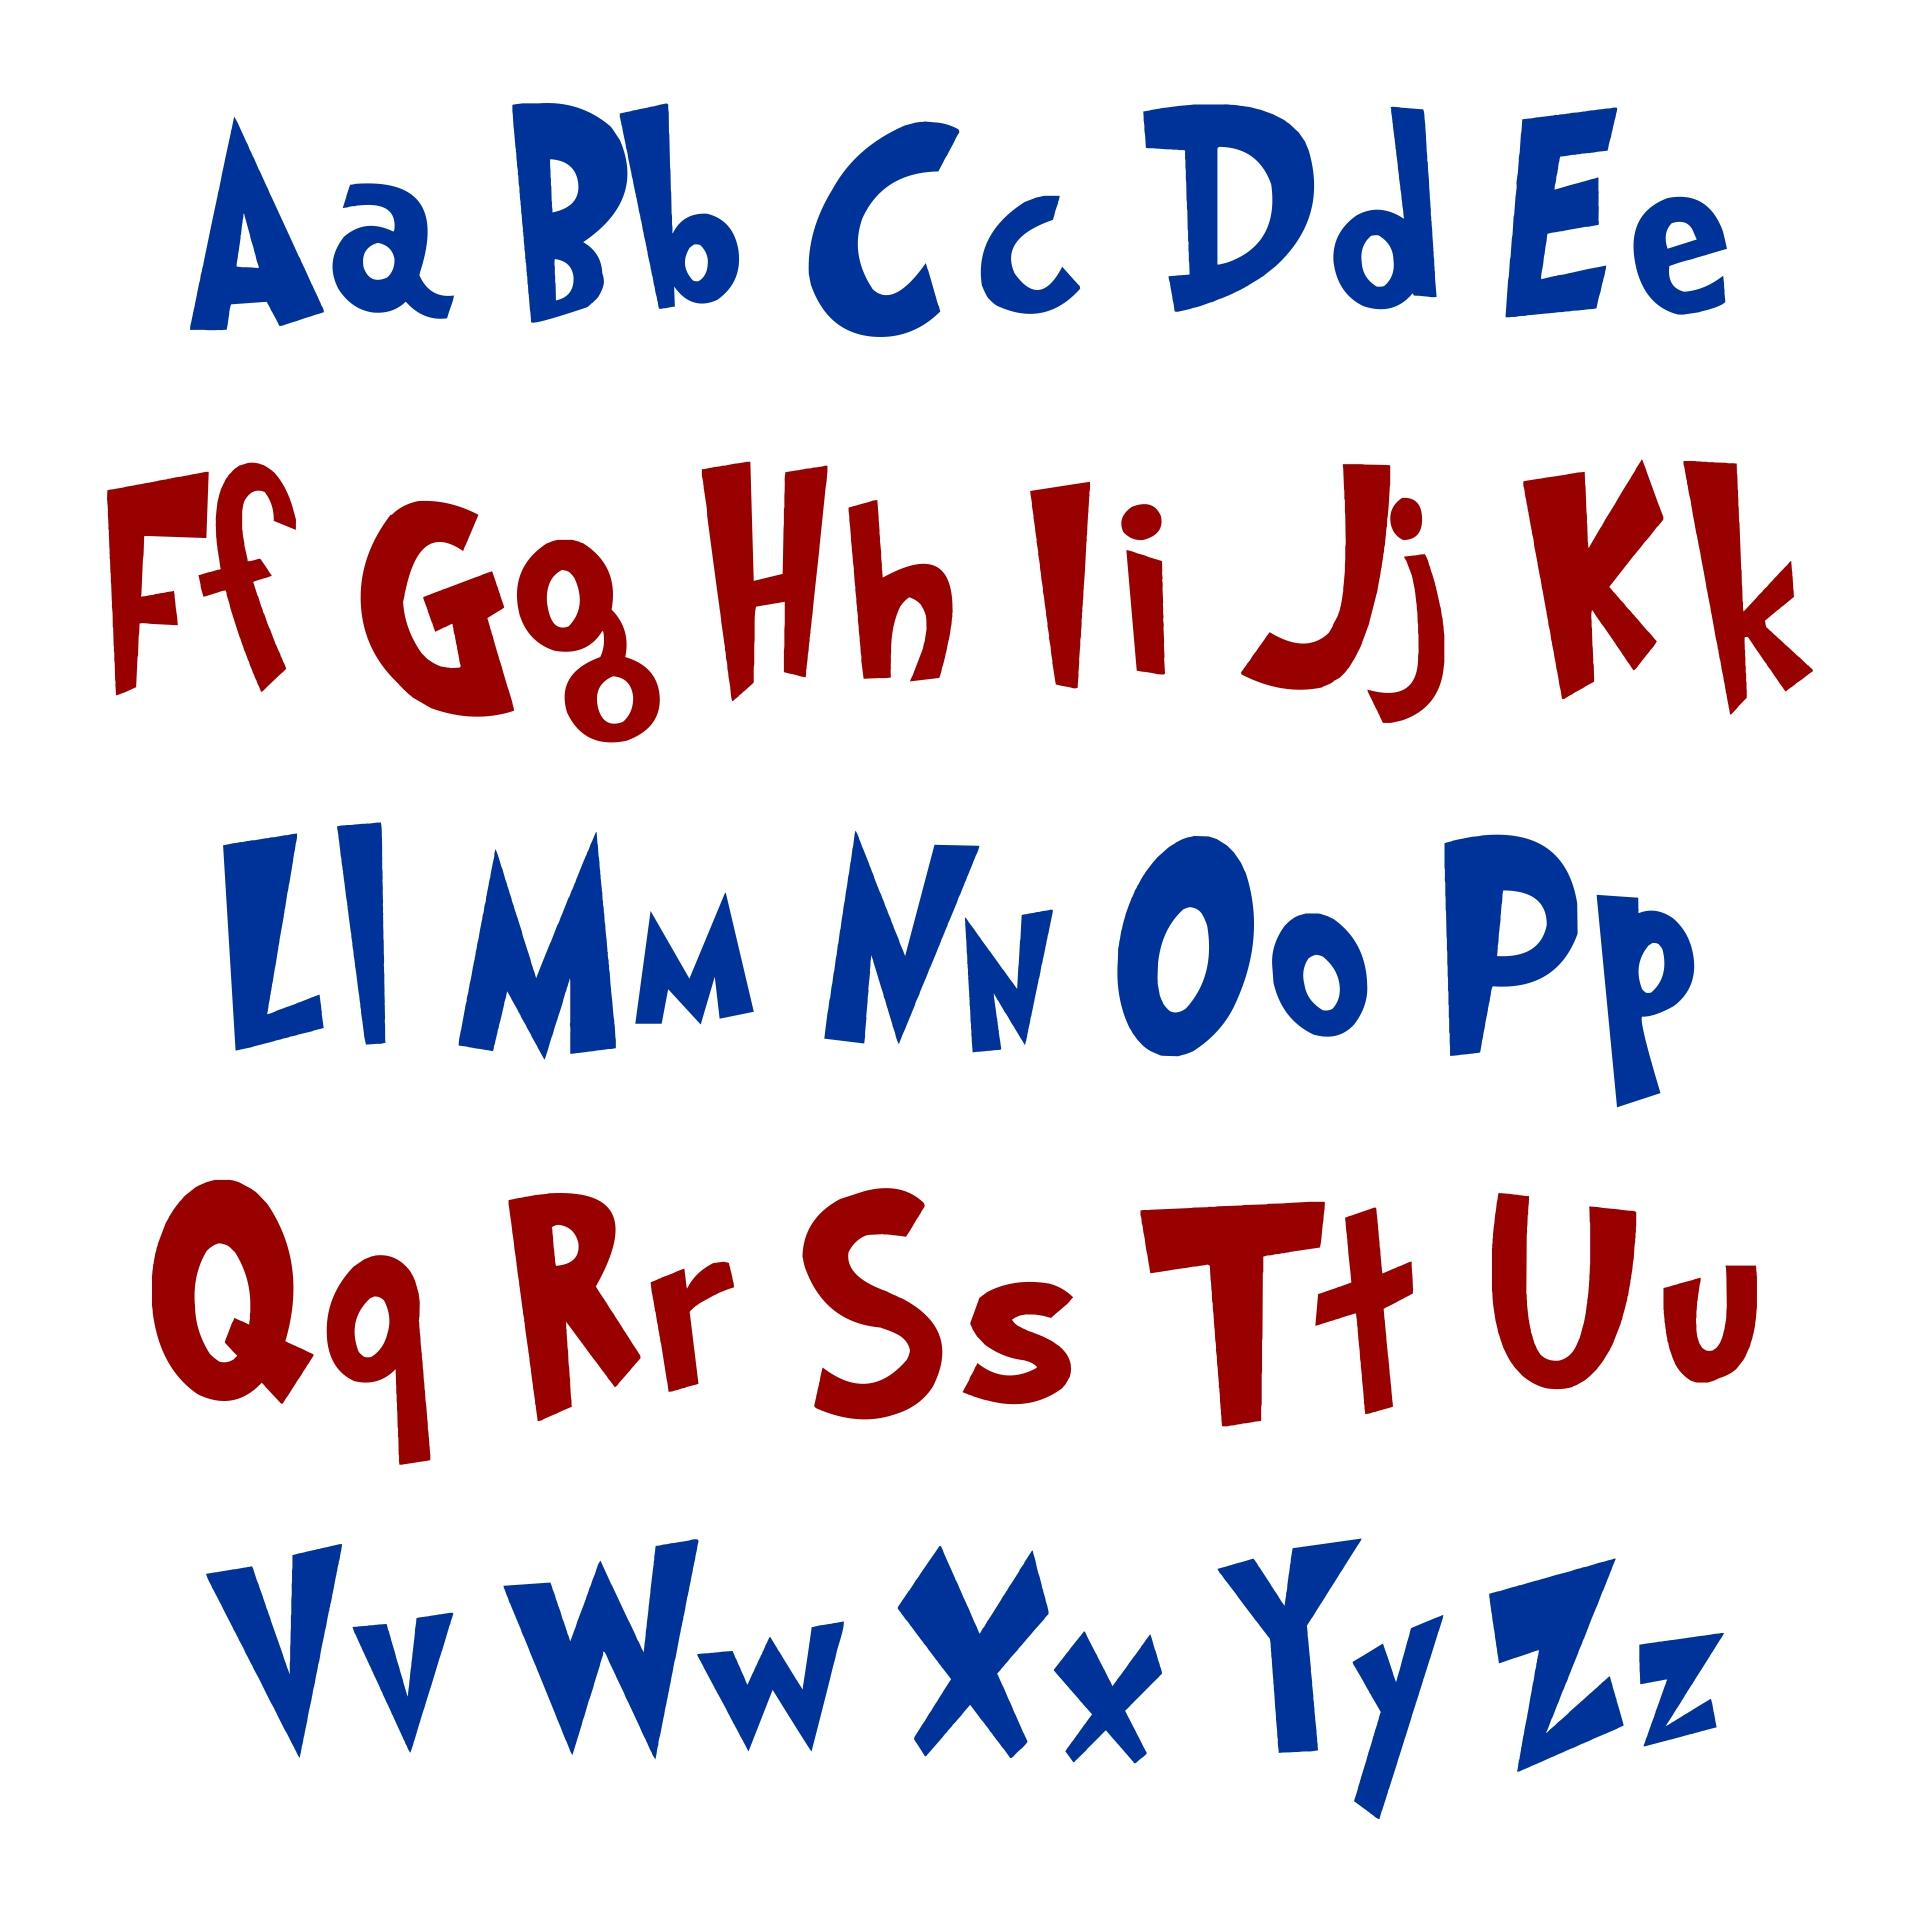 Dr. Seuss ABC Alphabet